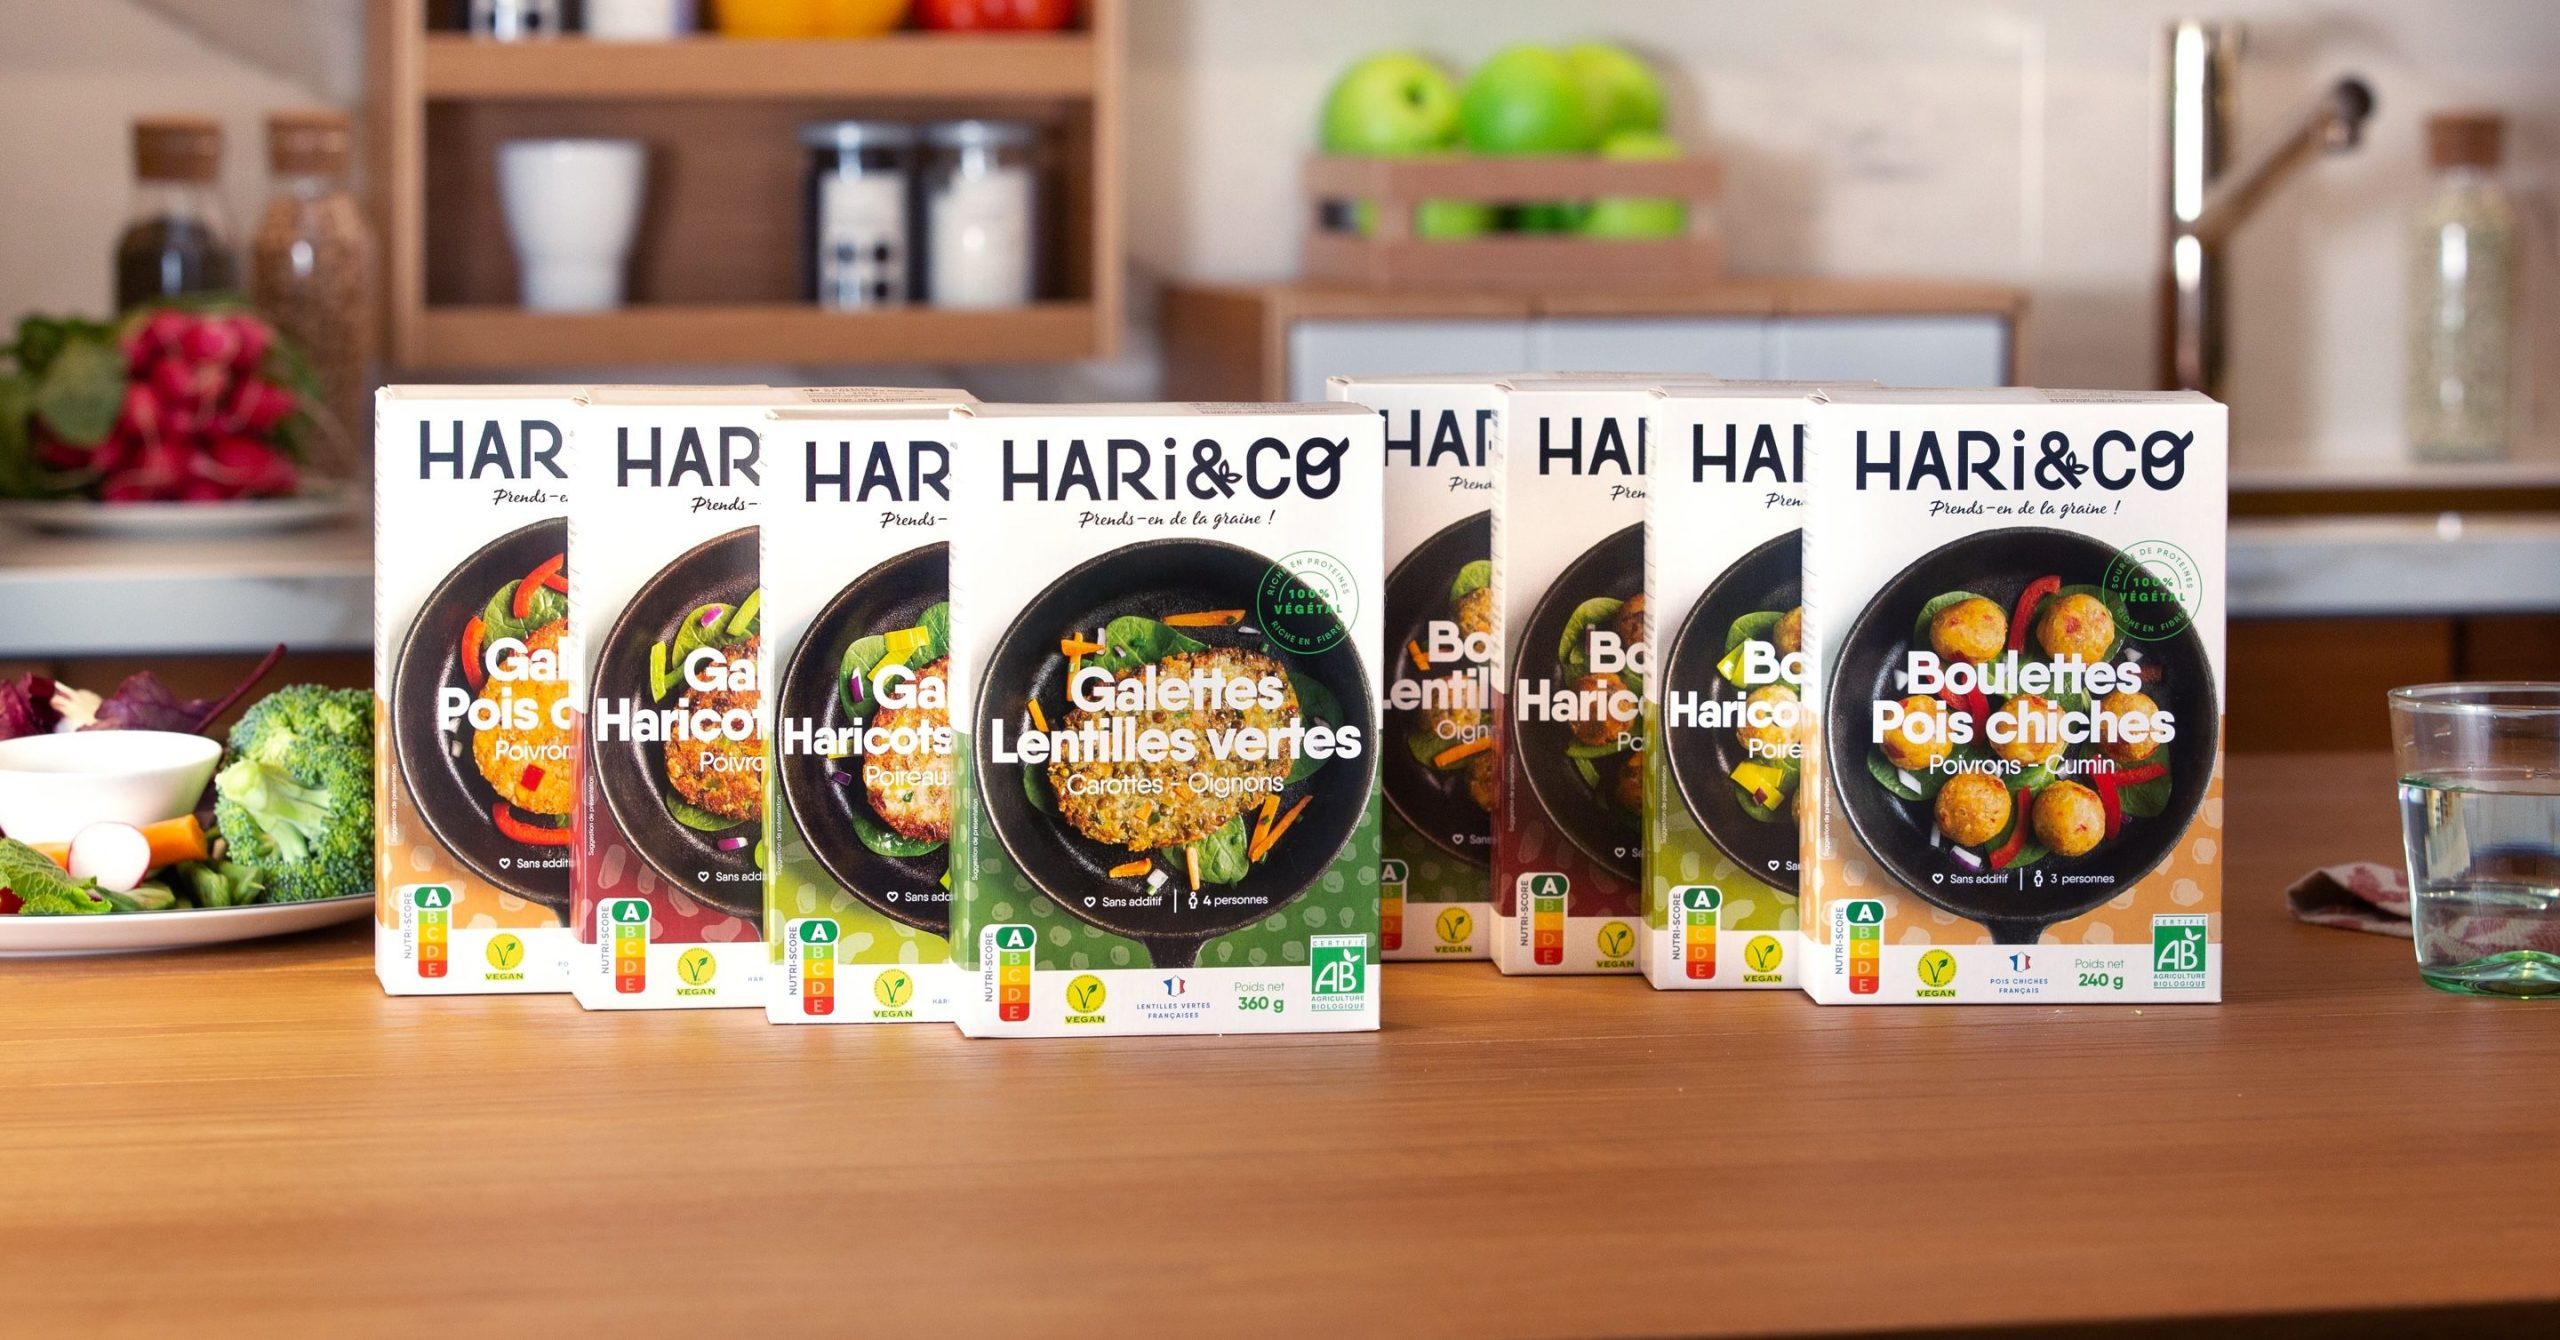 hari co boxes over kitchen table compressed scaled - Start-up : comment avancer vite ET bien ? La success story Hari&Co (1/3)